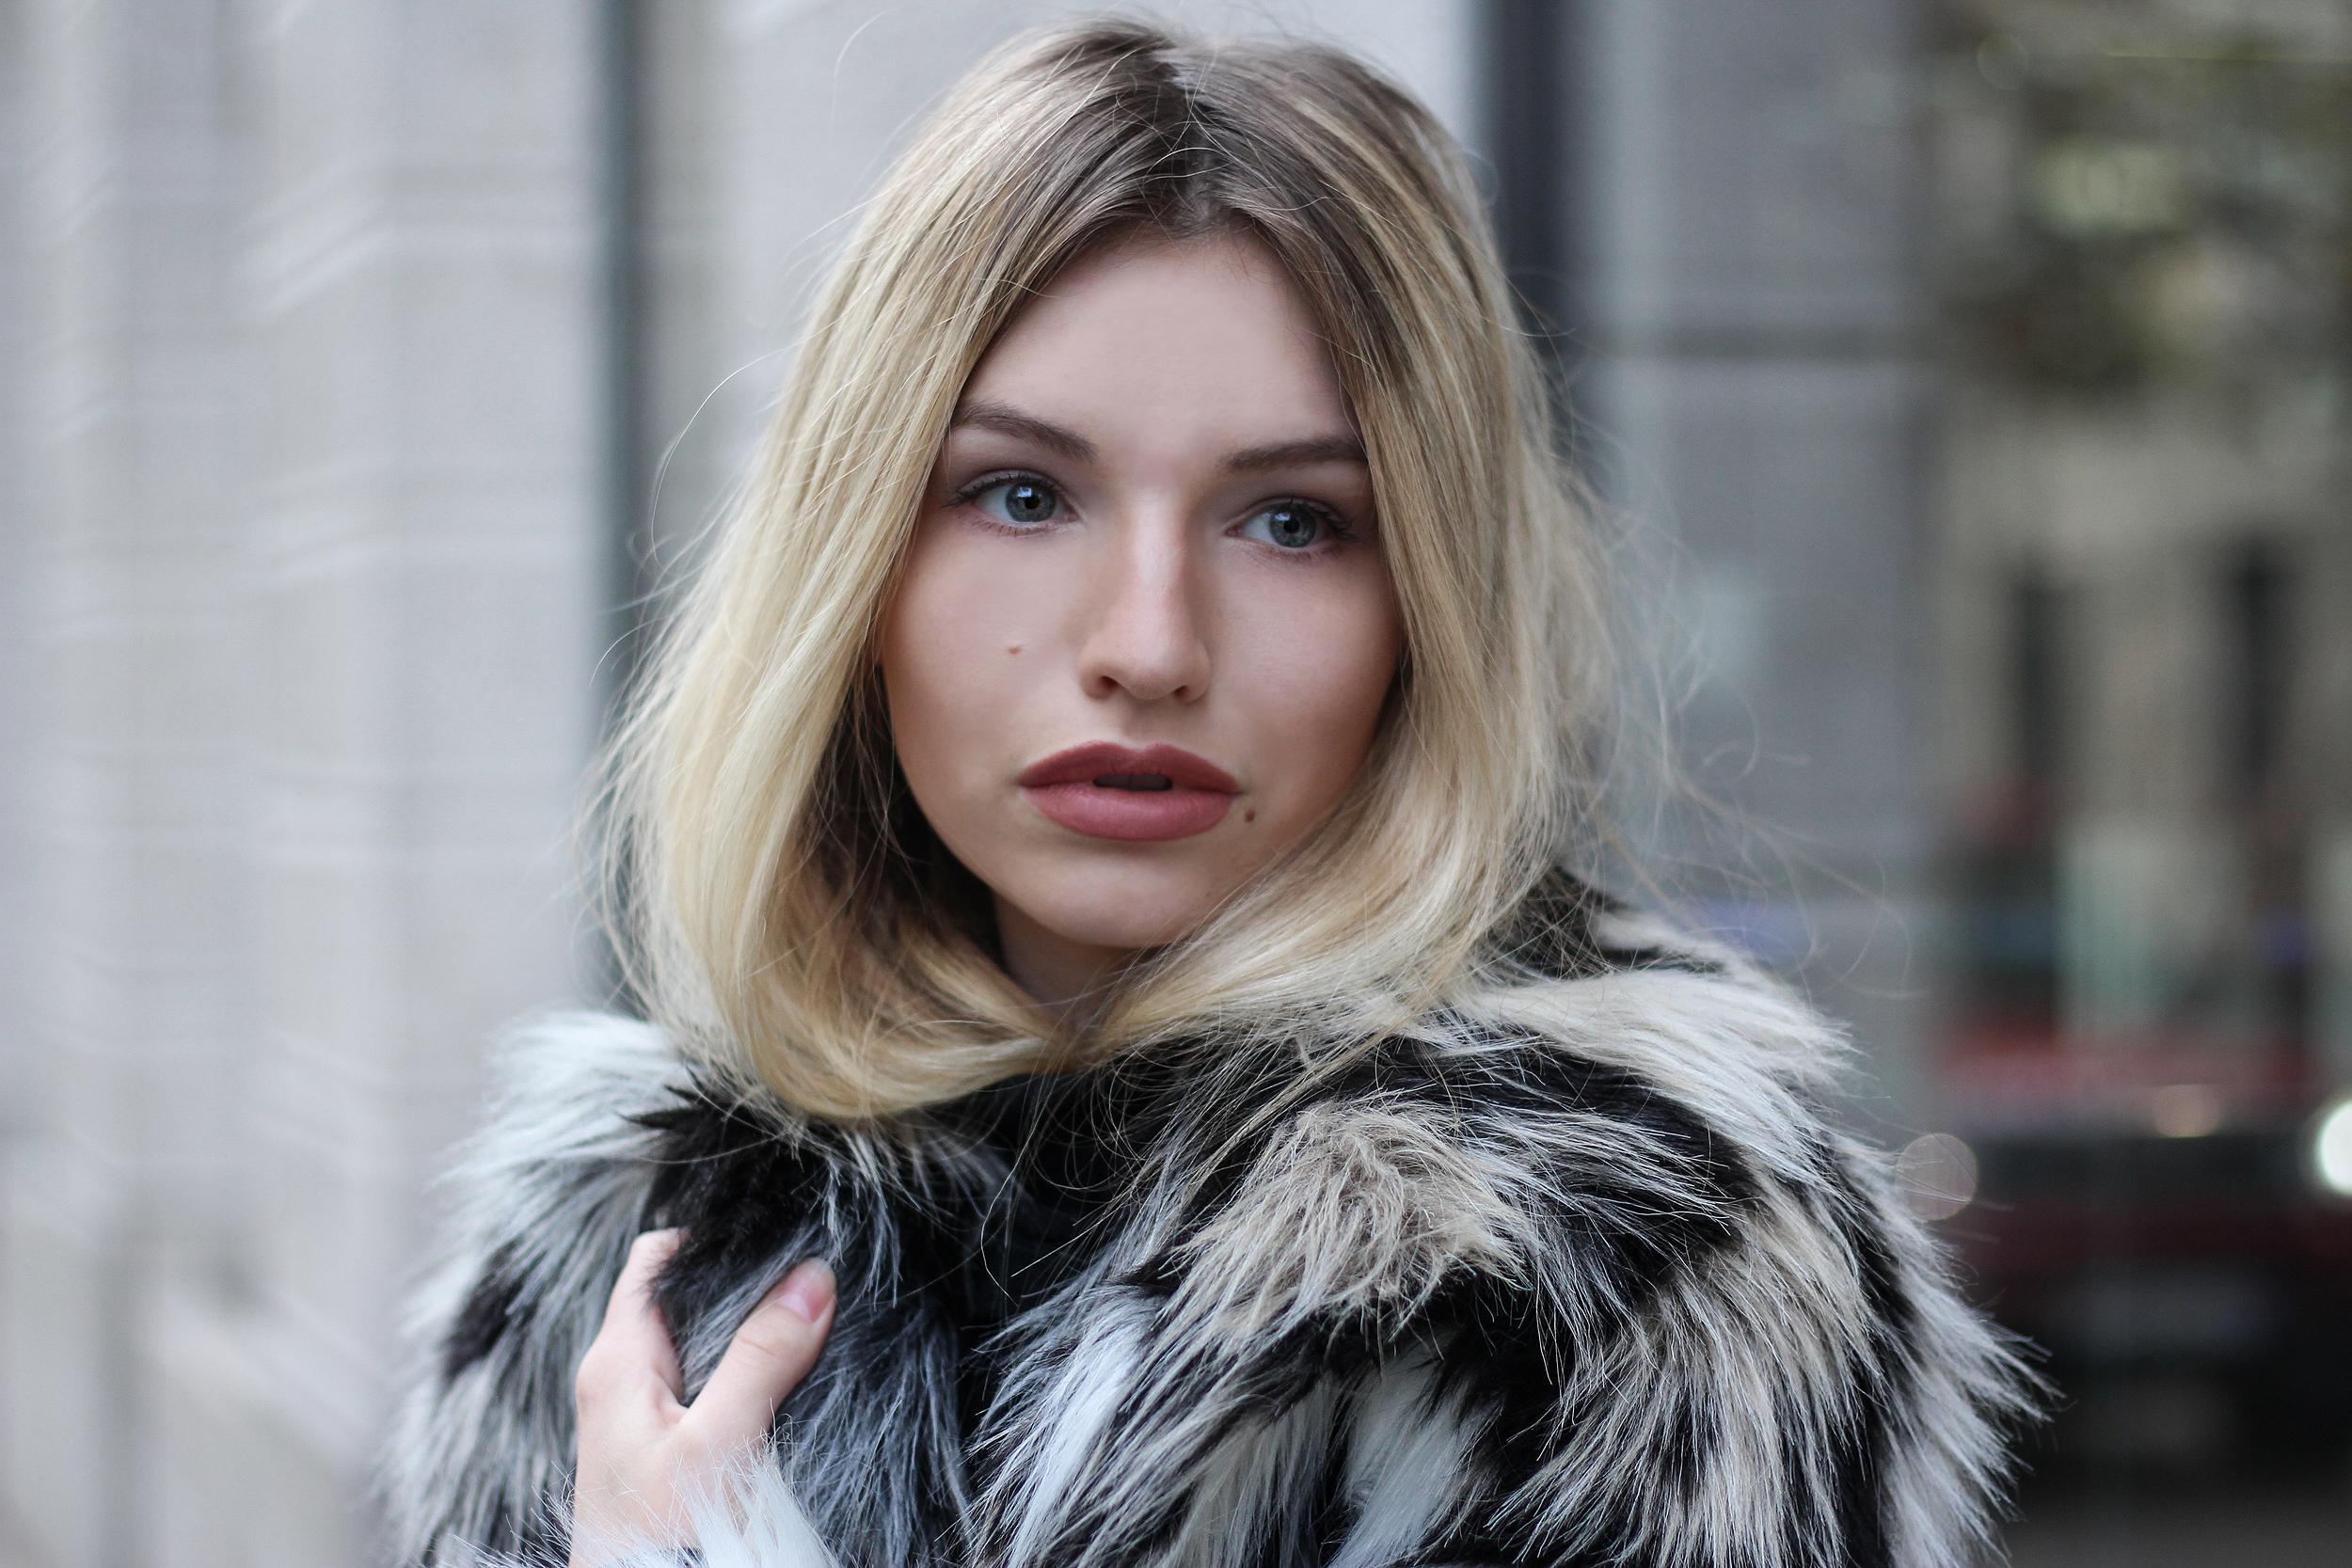 franziska-elea-blogger-aus-muenchen-fake-fur-jacke-netzstrumpfhose-overknee-stiefel-guess-lederrucksack-minirucksack-portrait-blondine-details